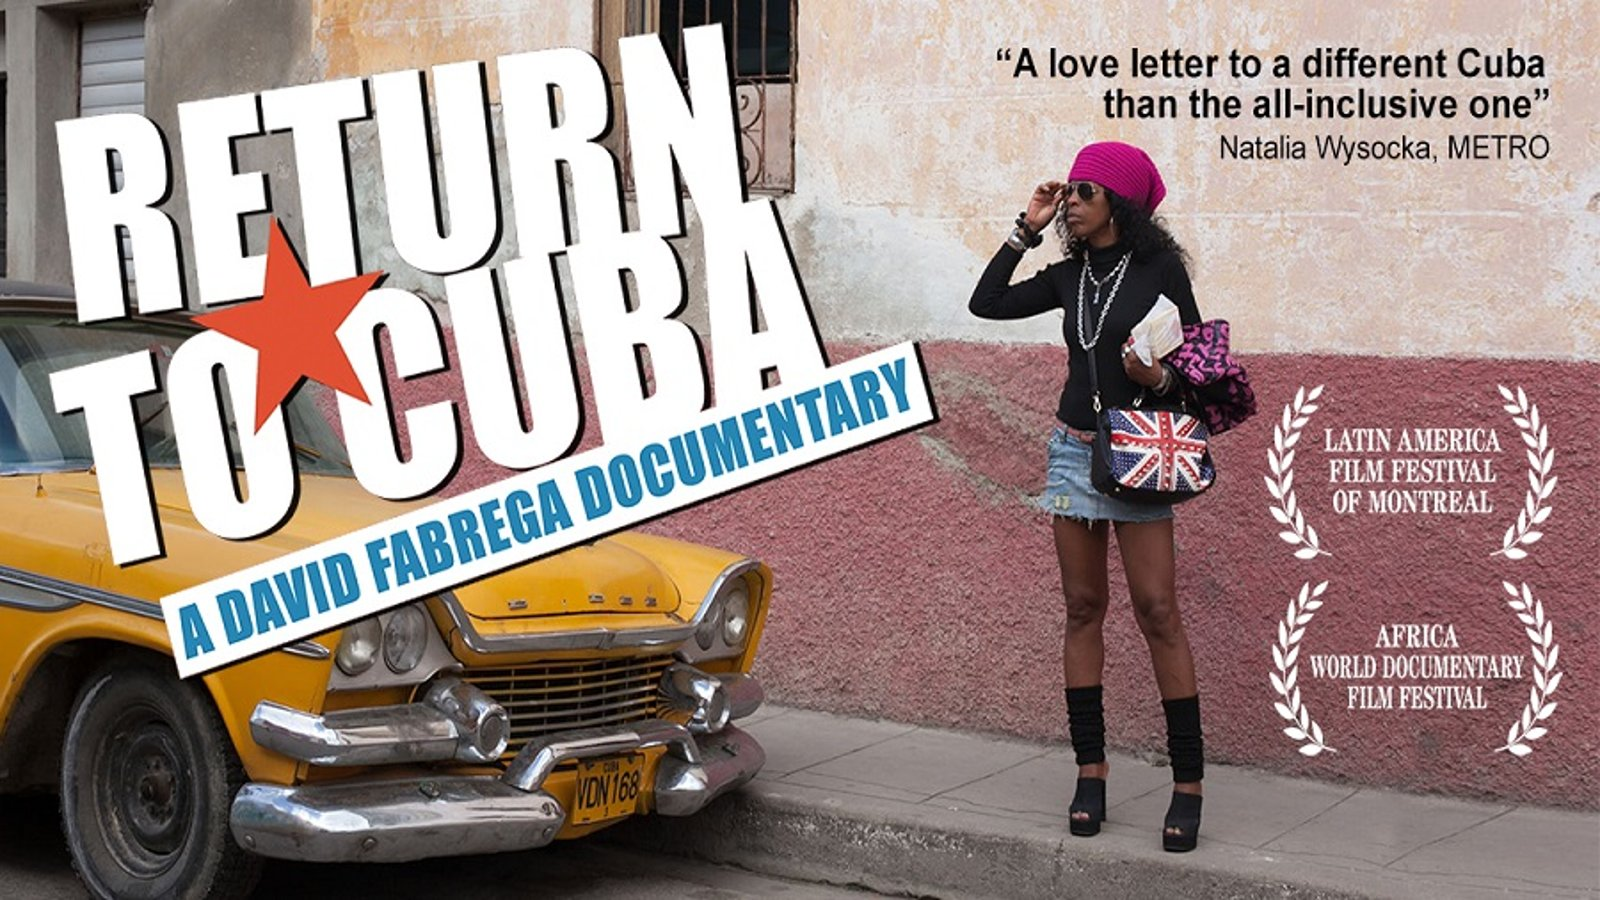 Return to Cuba - Life in Cuba After Castro